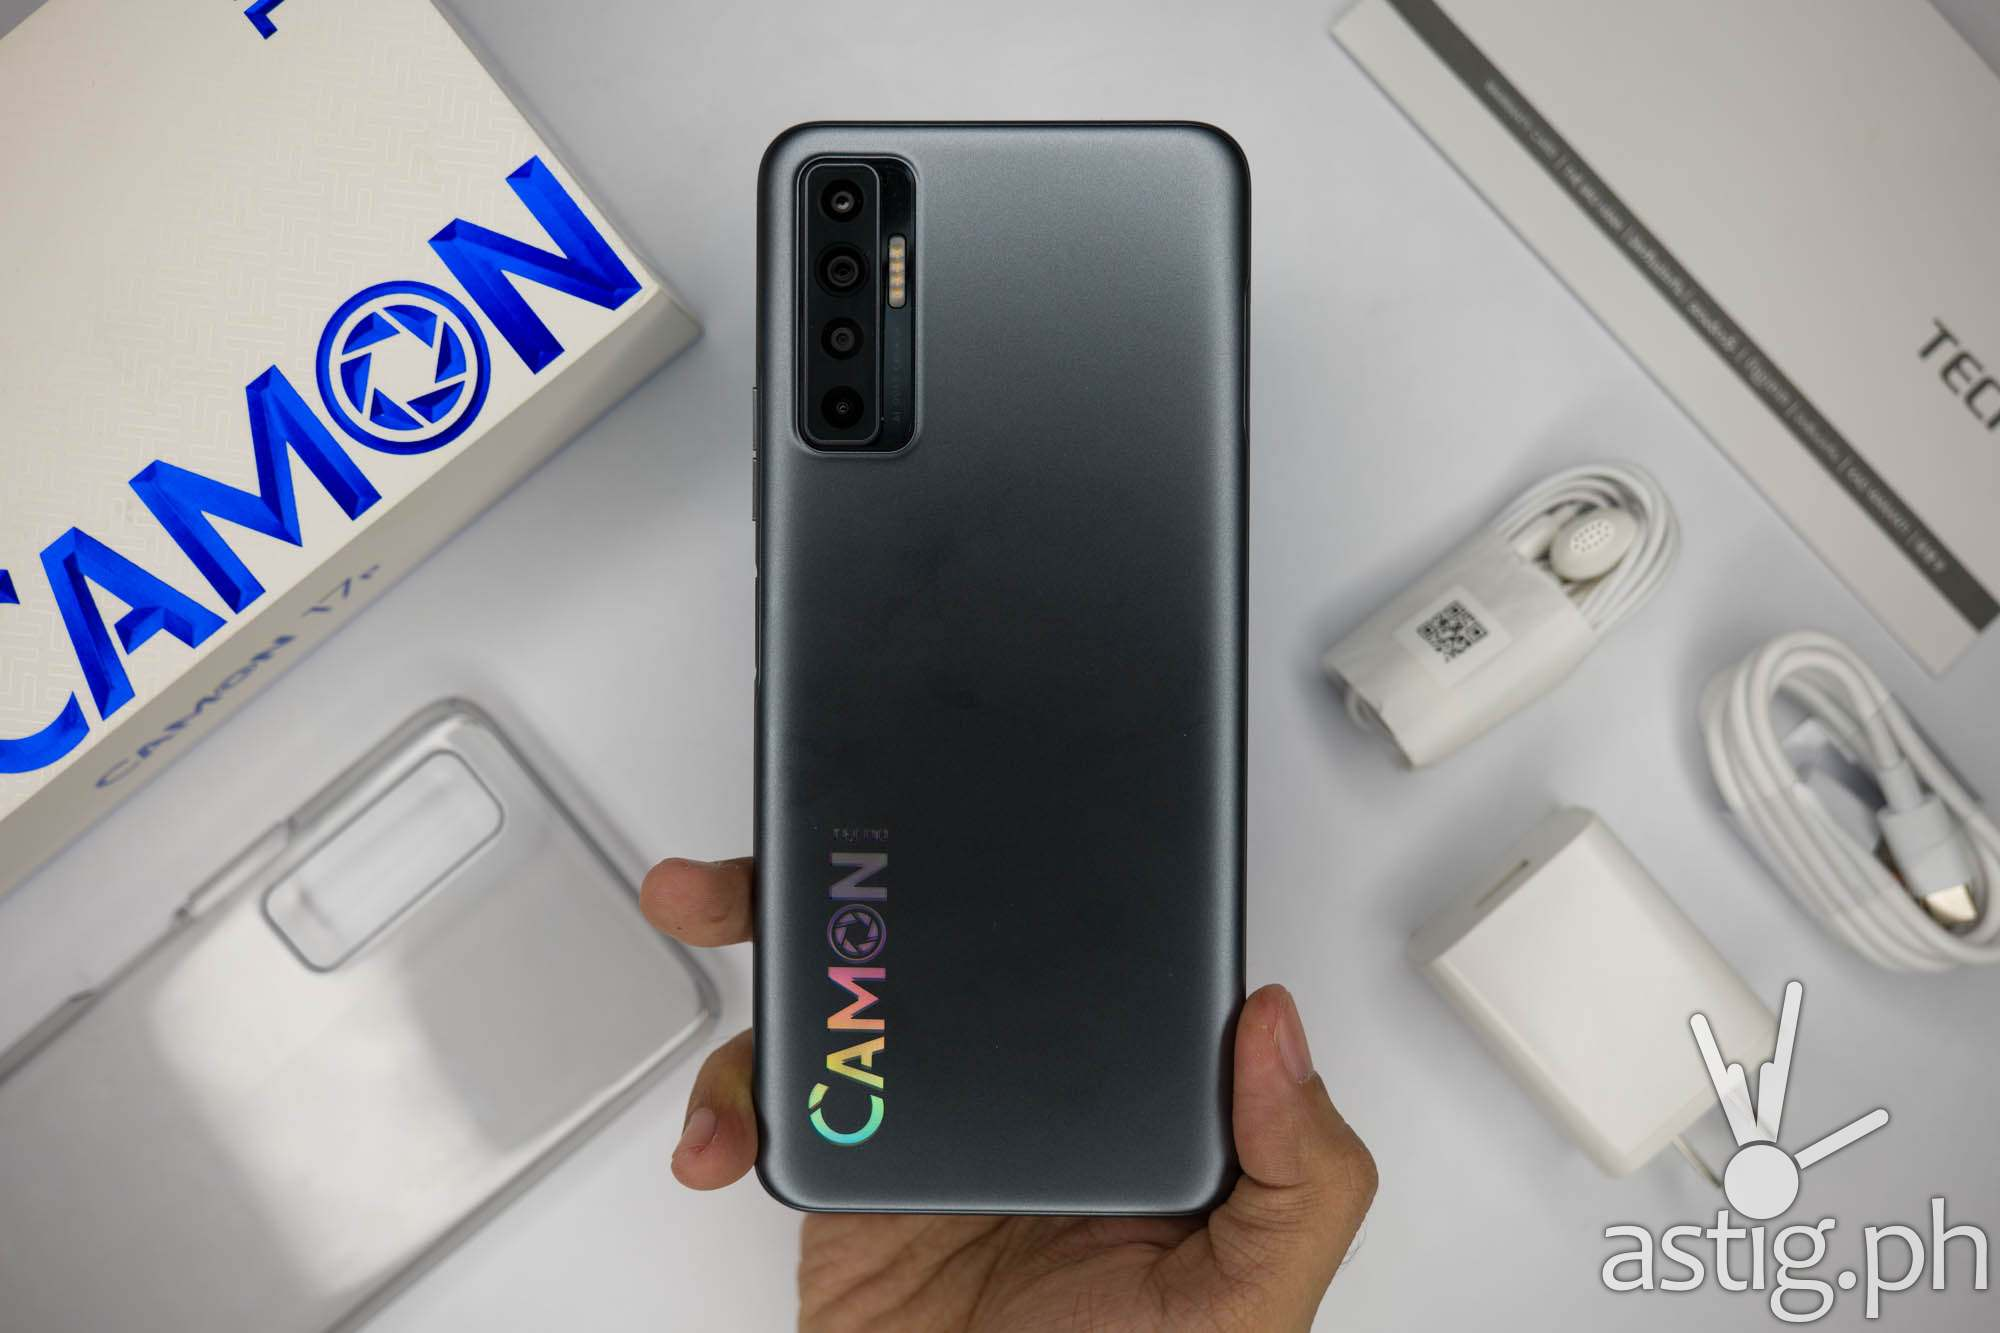 Handheld back - TECNO Camon 17P (Philippines)